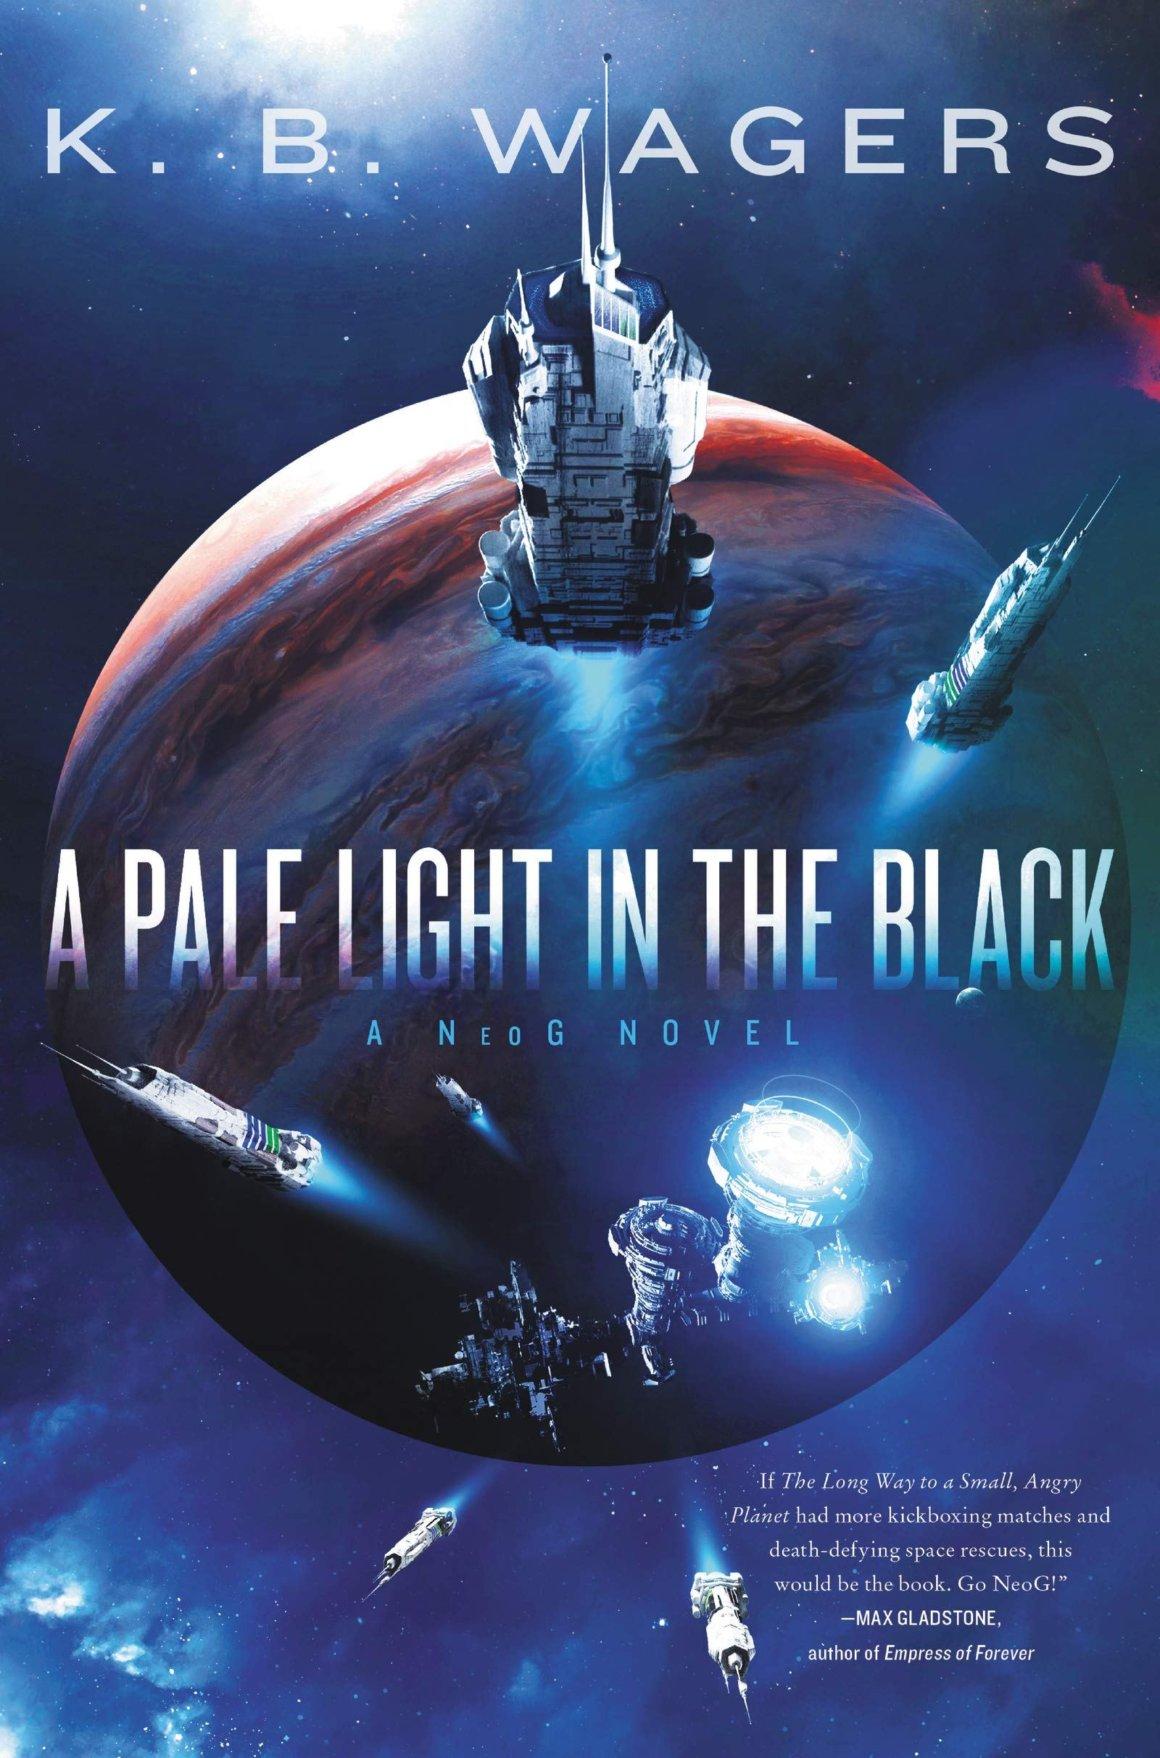 A Pale Light in the Black - de mest populære Sci-Fi